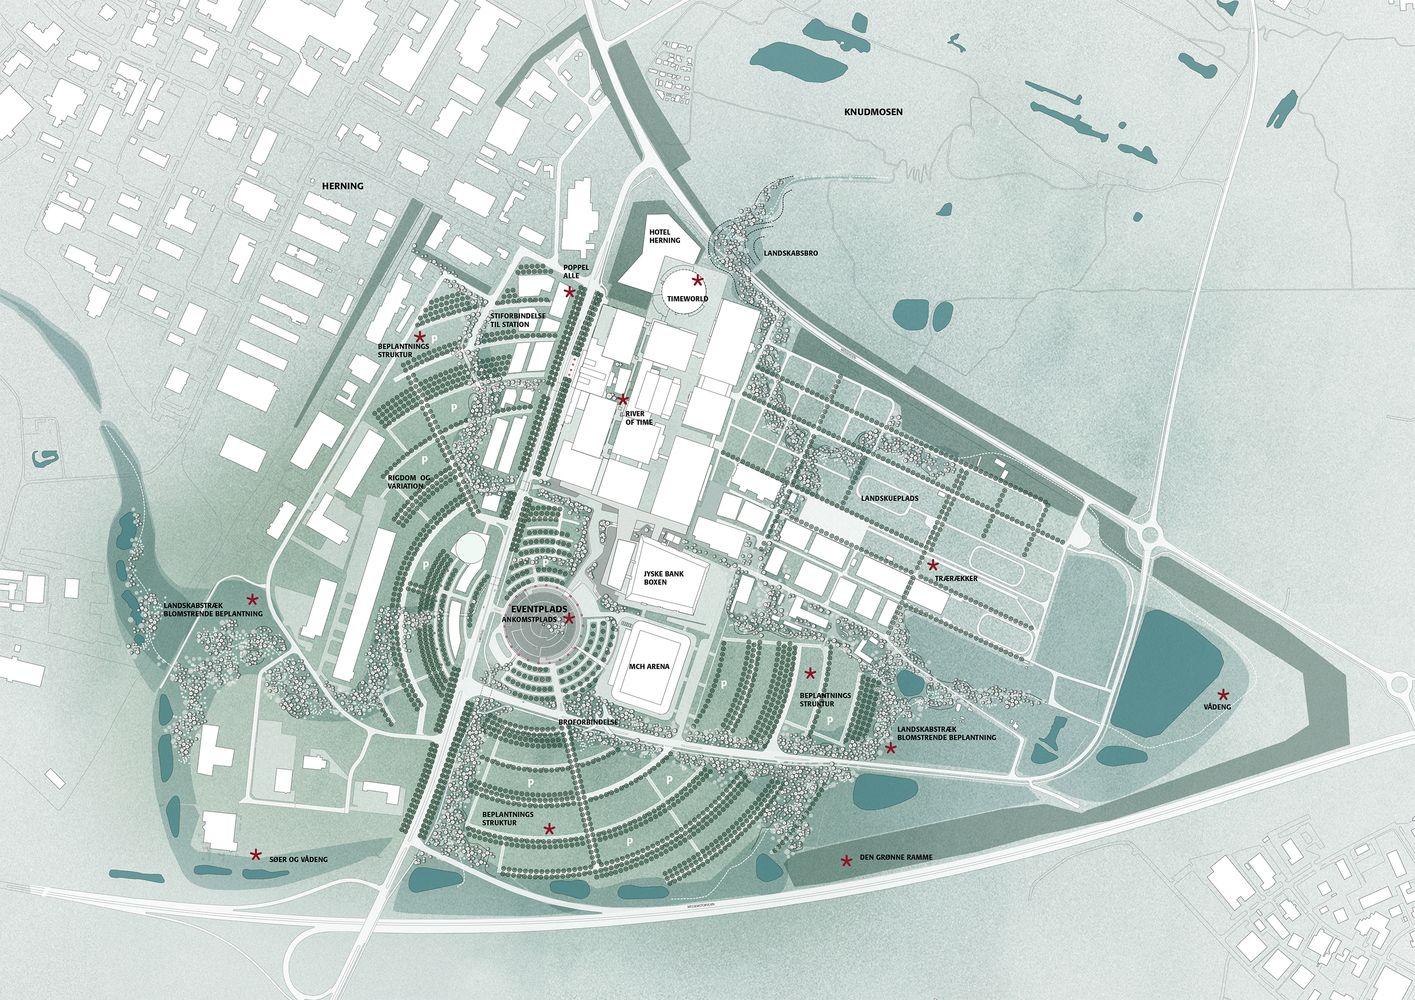 Gallery Of Mch Messecenter Herning Cubo Arkitekter 14 Arkitekter Skitse Billeder